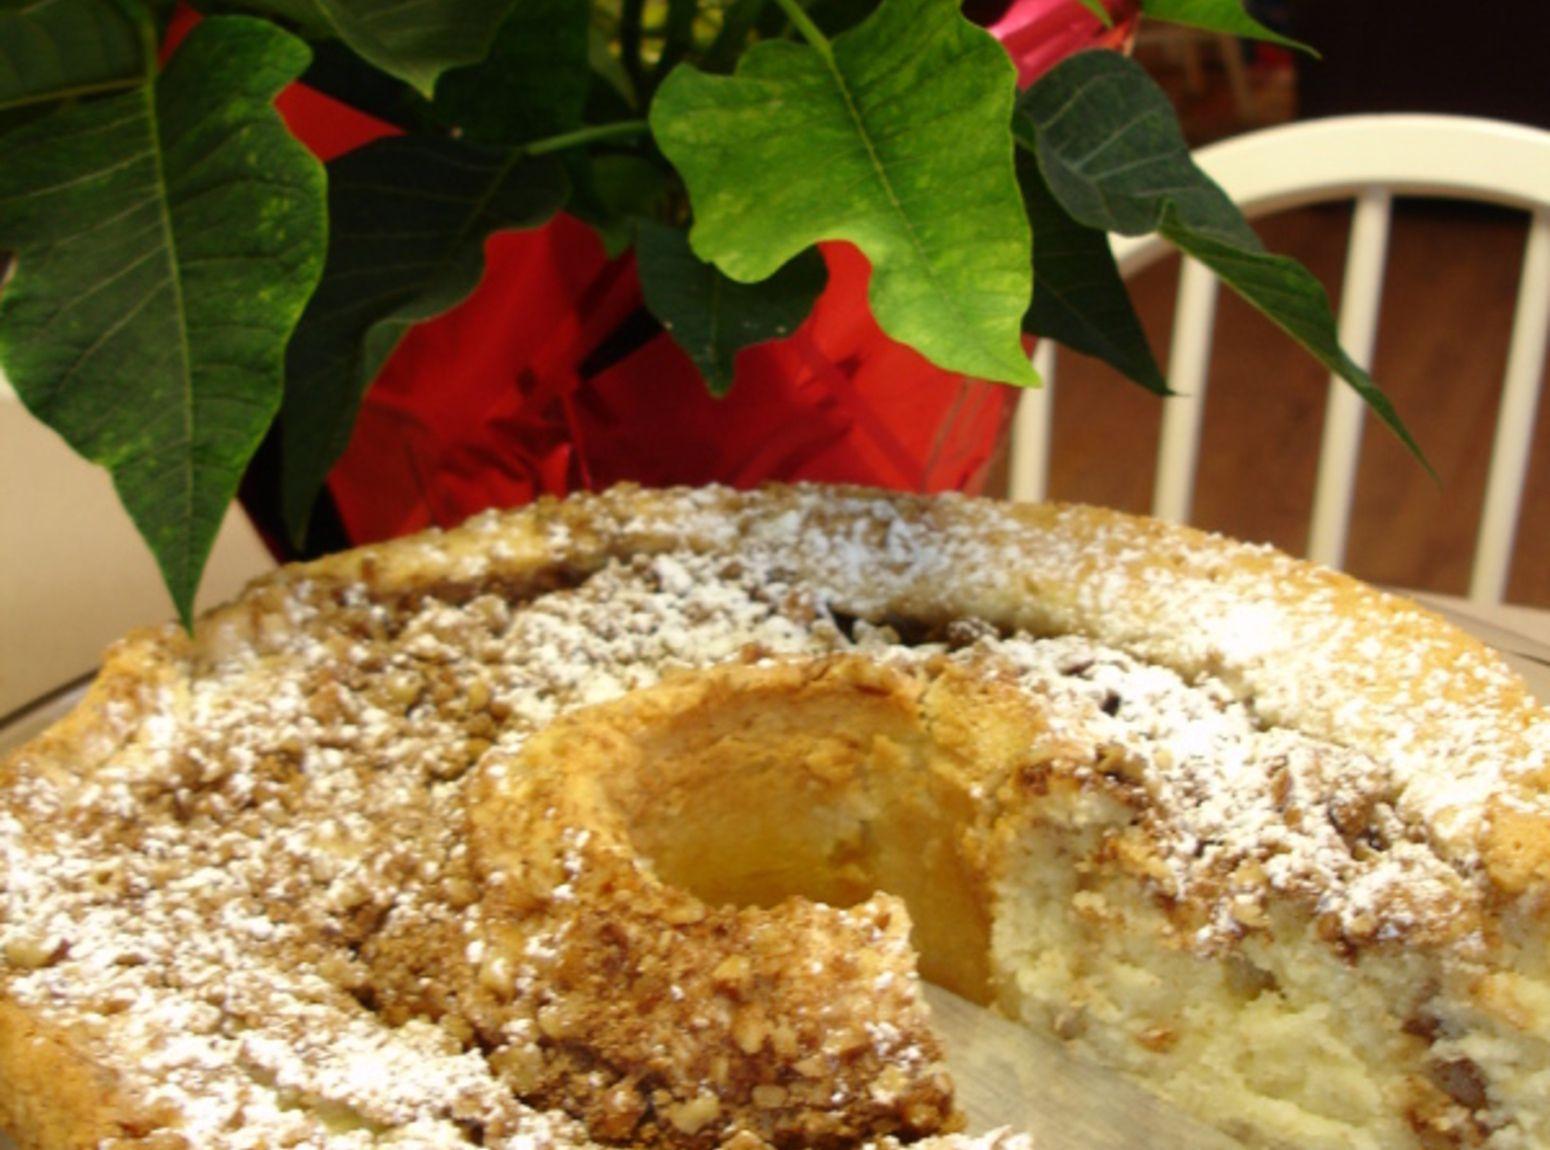 Sour Cream Coffee Cake Recipe 6 Just A Pinch Recipes Coffee Cake Sour Cream Coffee Cake Coffee Recipes